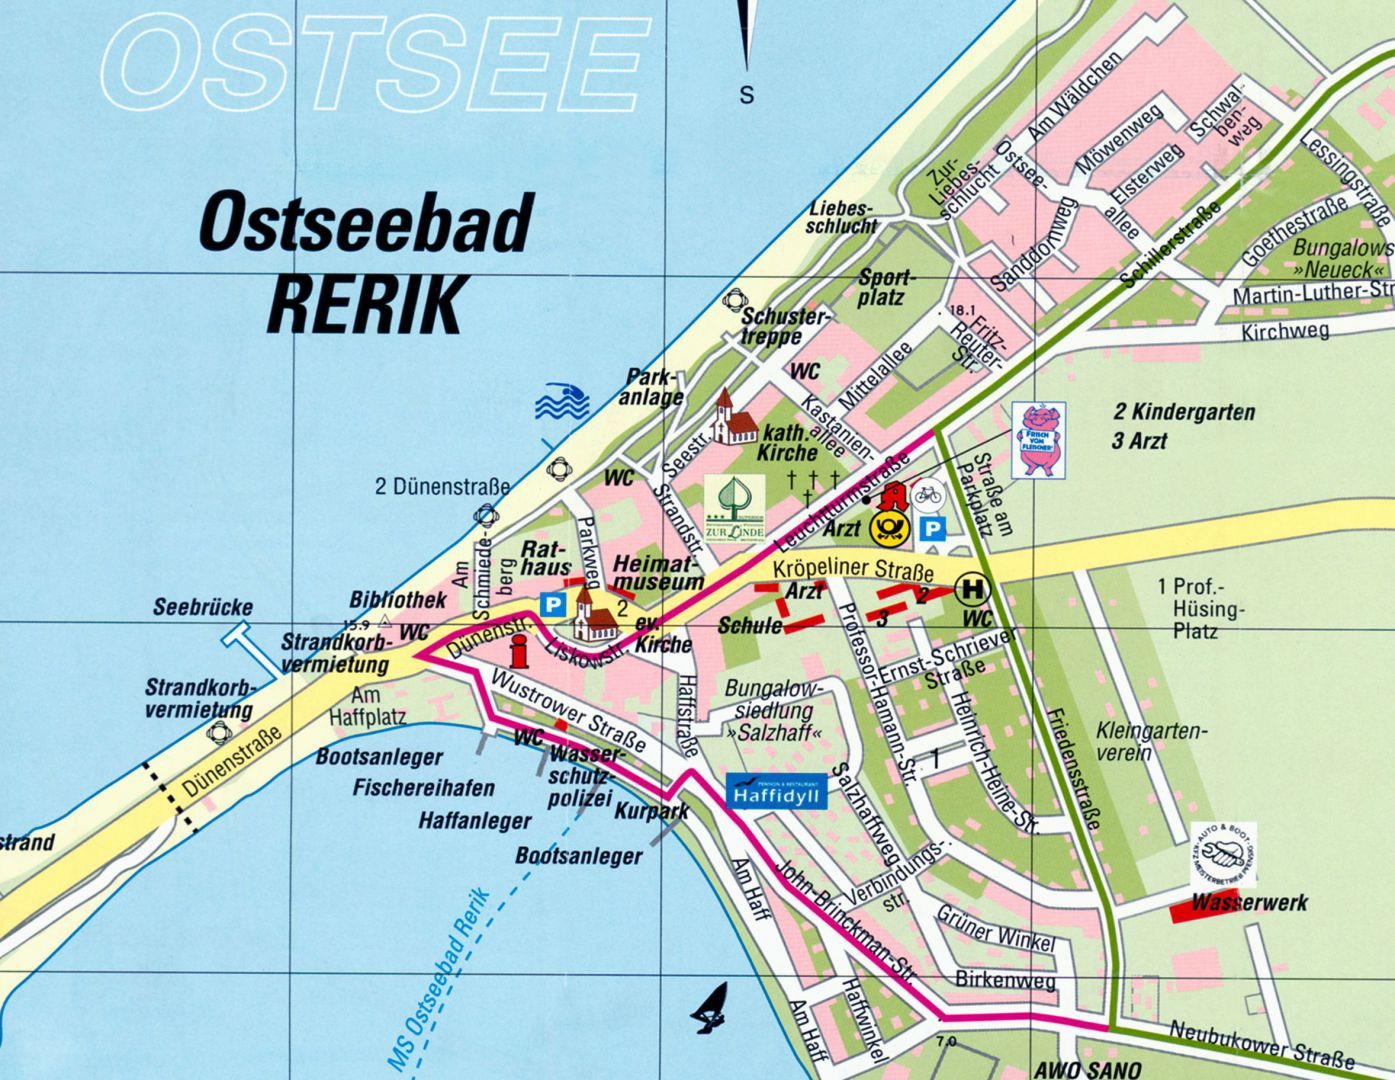 rerik karte Rerik Ostsee Karte   hanzeontwerpfabriek